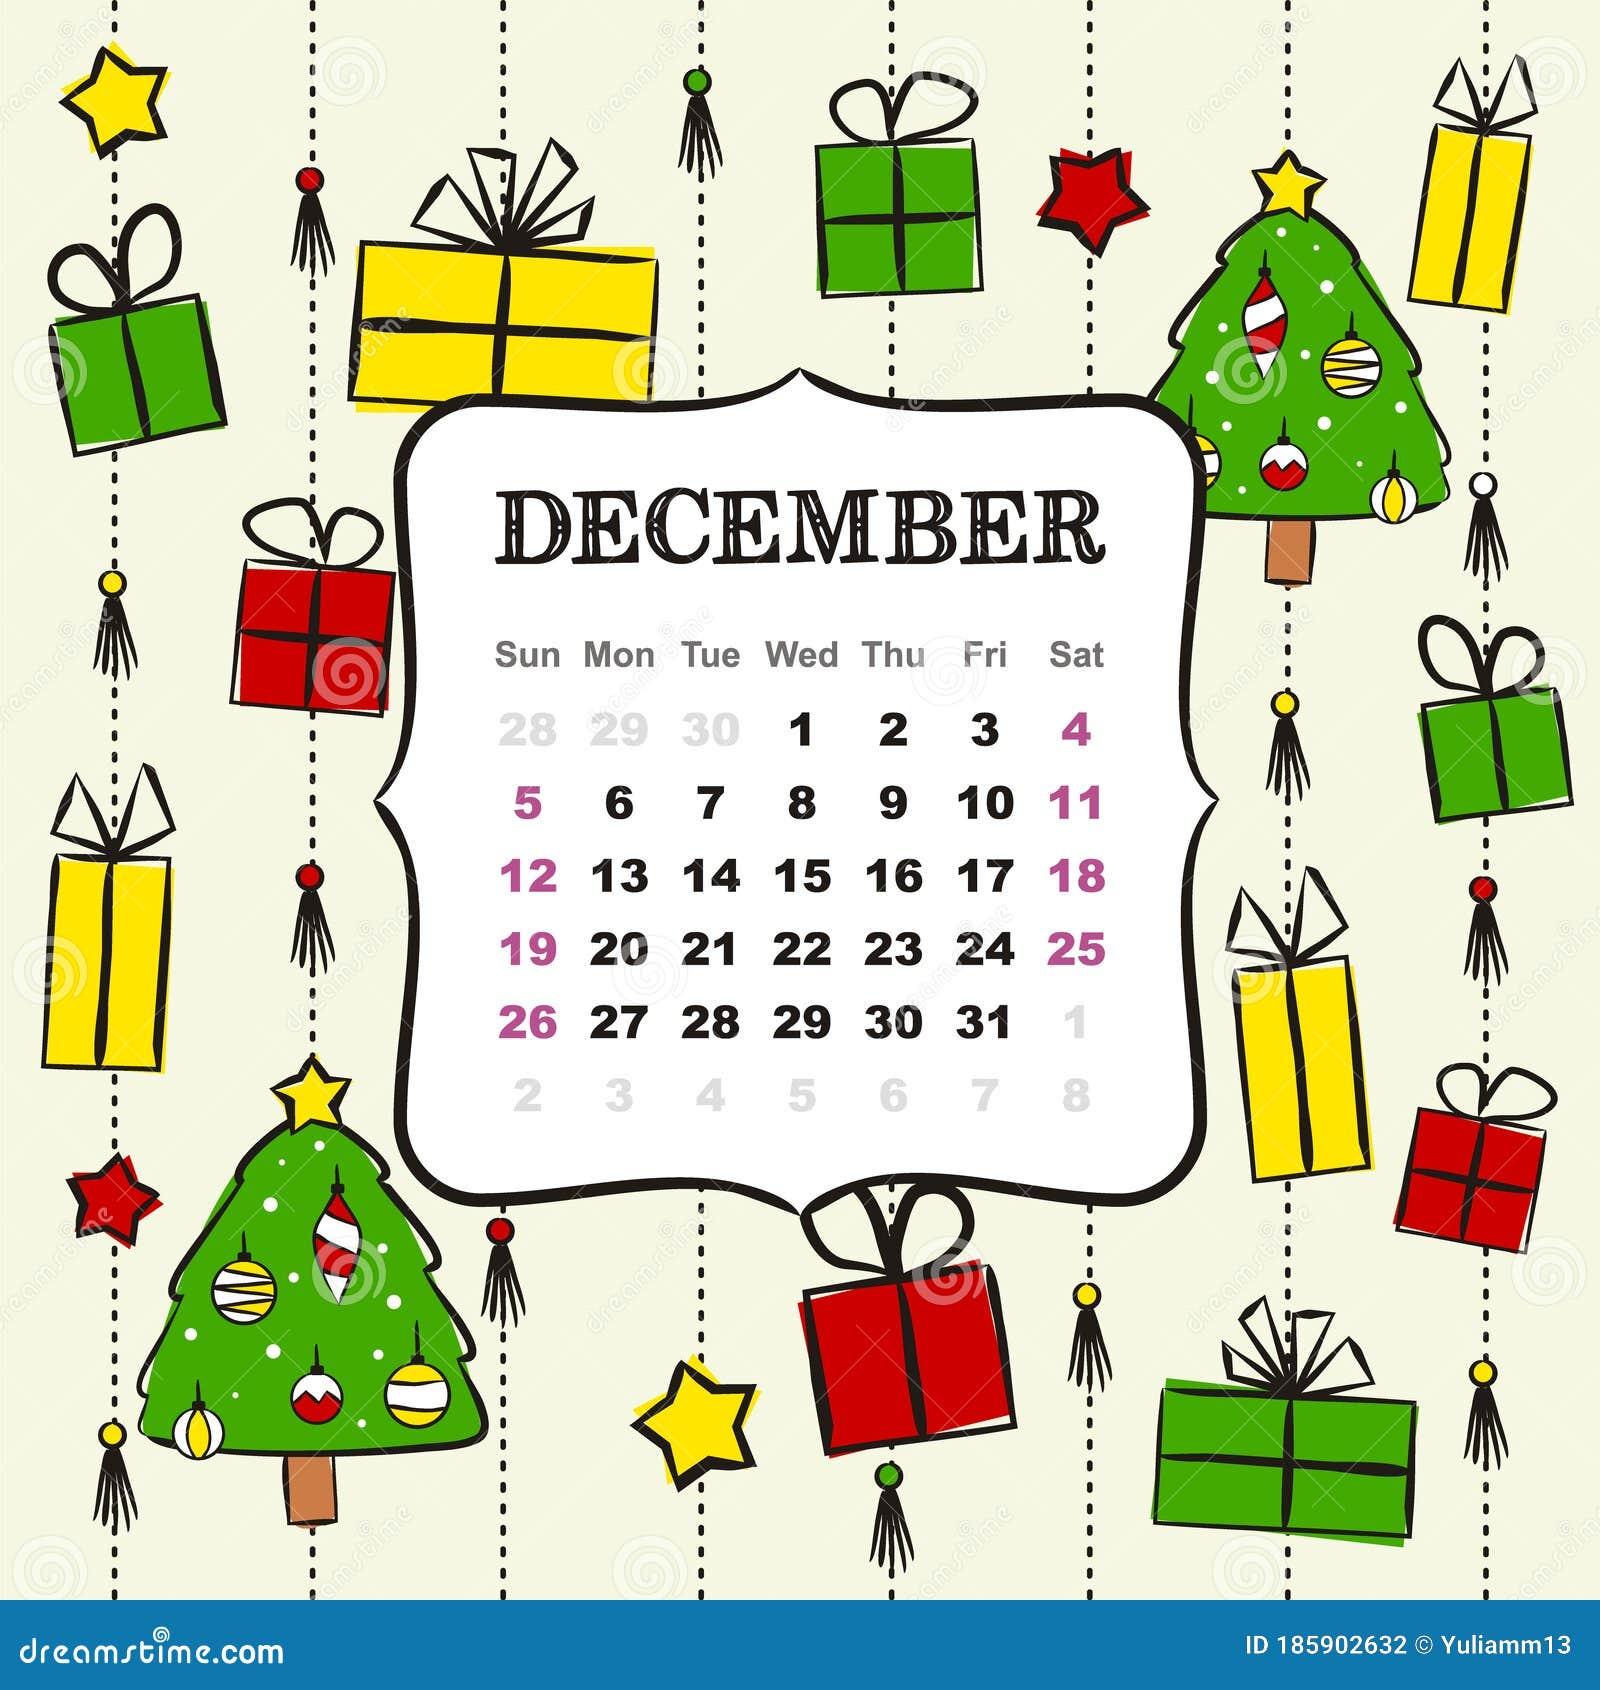 Calendar December 2021 Christmas Thematic Template For A Calendar For 2021 December Stock Illustration Illustration Of Design July 185902632